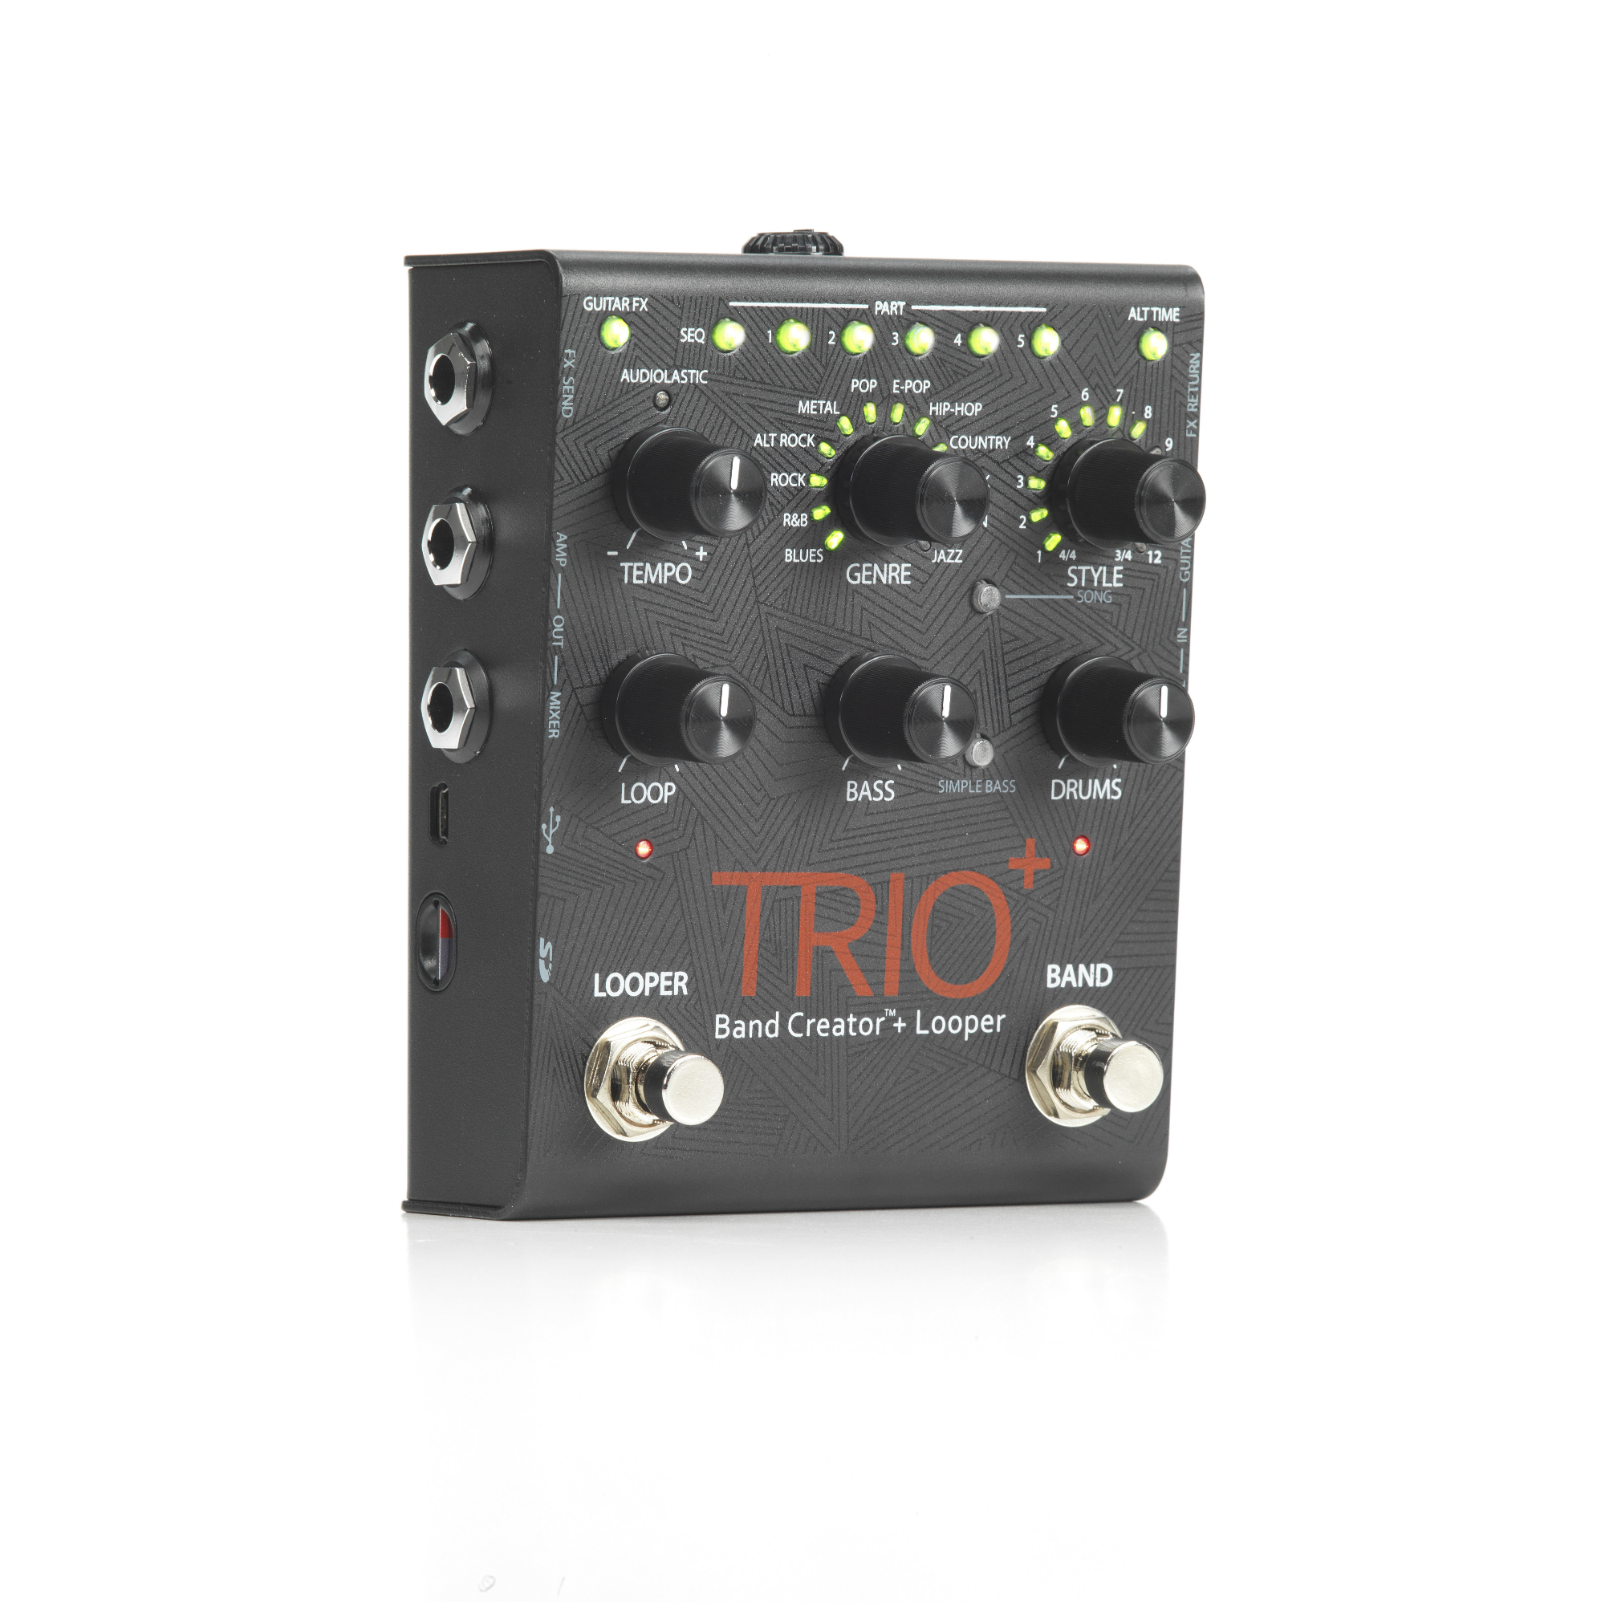 TRIO+ - Black - Band Creator + Looper - Hero